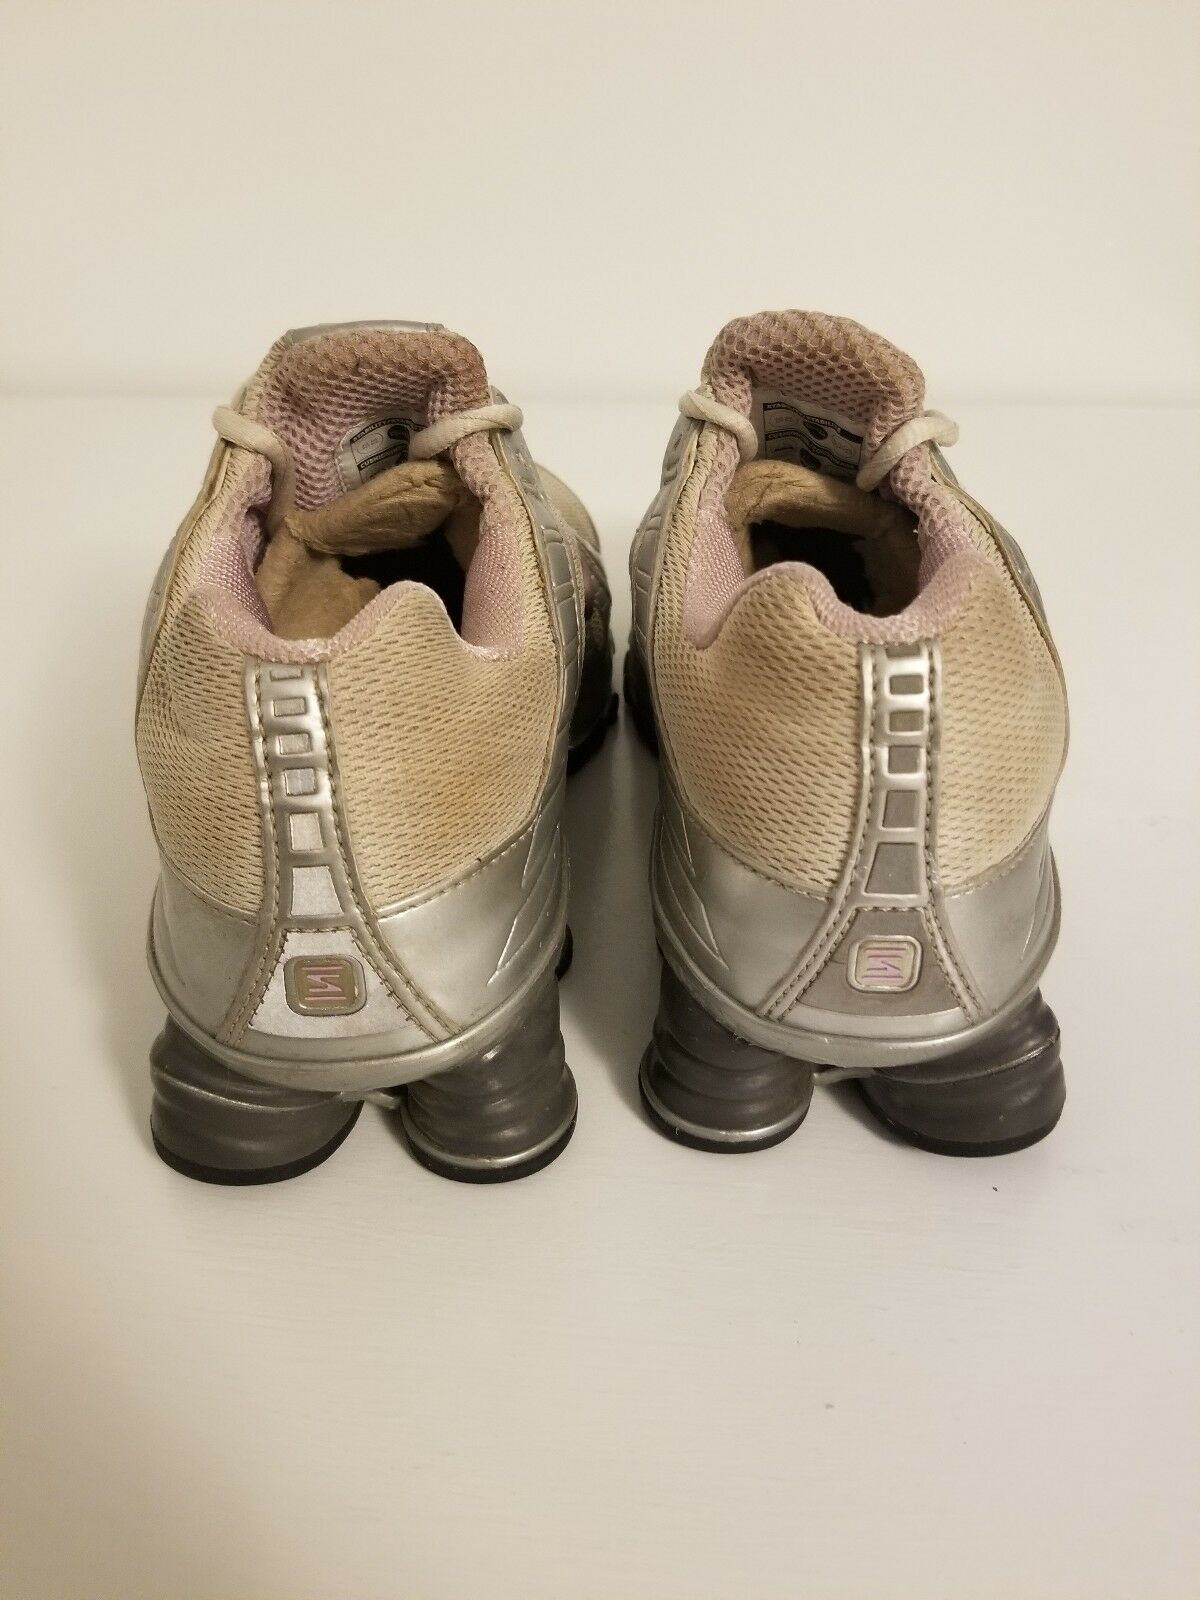 nike nike nike shox nz patrimonio donne scarpe da corsa silver / bianco.dimensioni 9.5. | Trendy  | Sig/Sig Ra Scarpa  | Uomo/Donne Scarpa  6ccc64